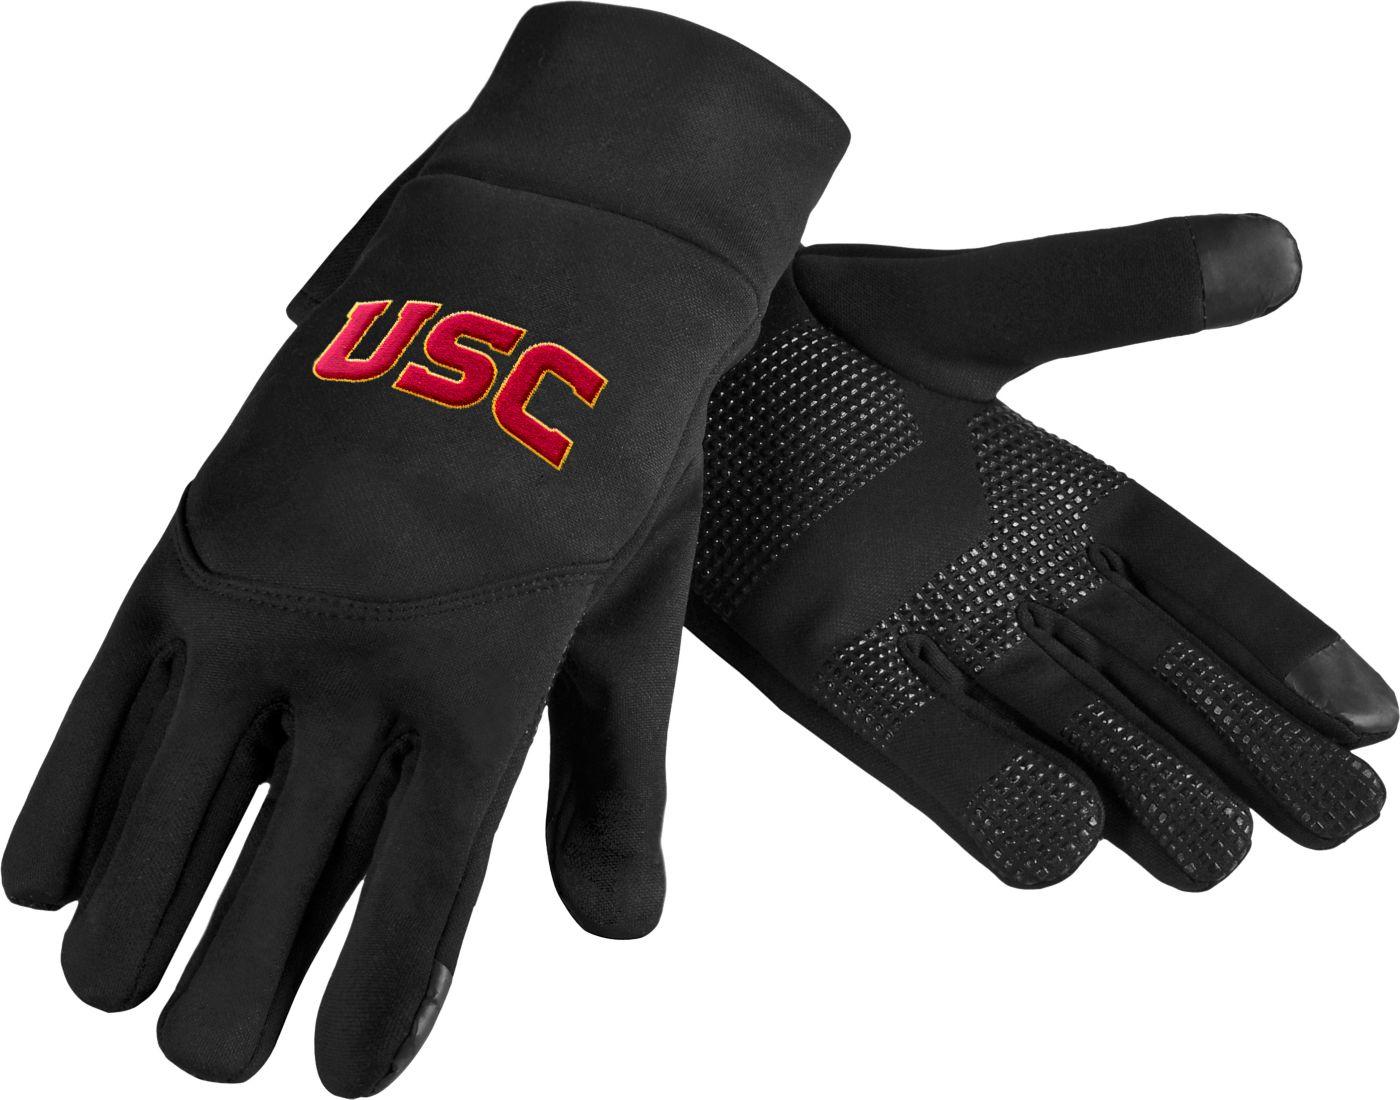 FOCO USC Trojans Texting Gloves